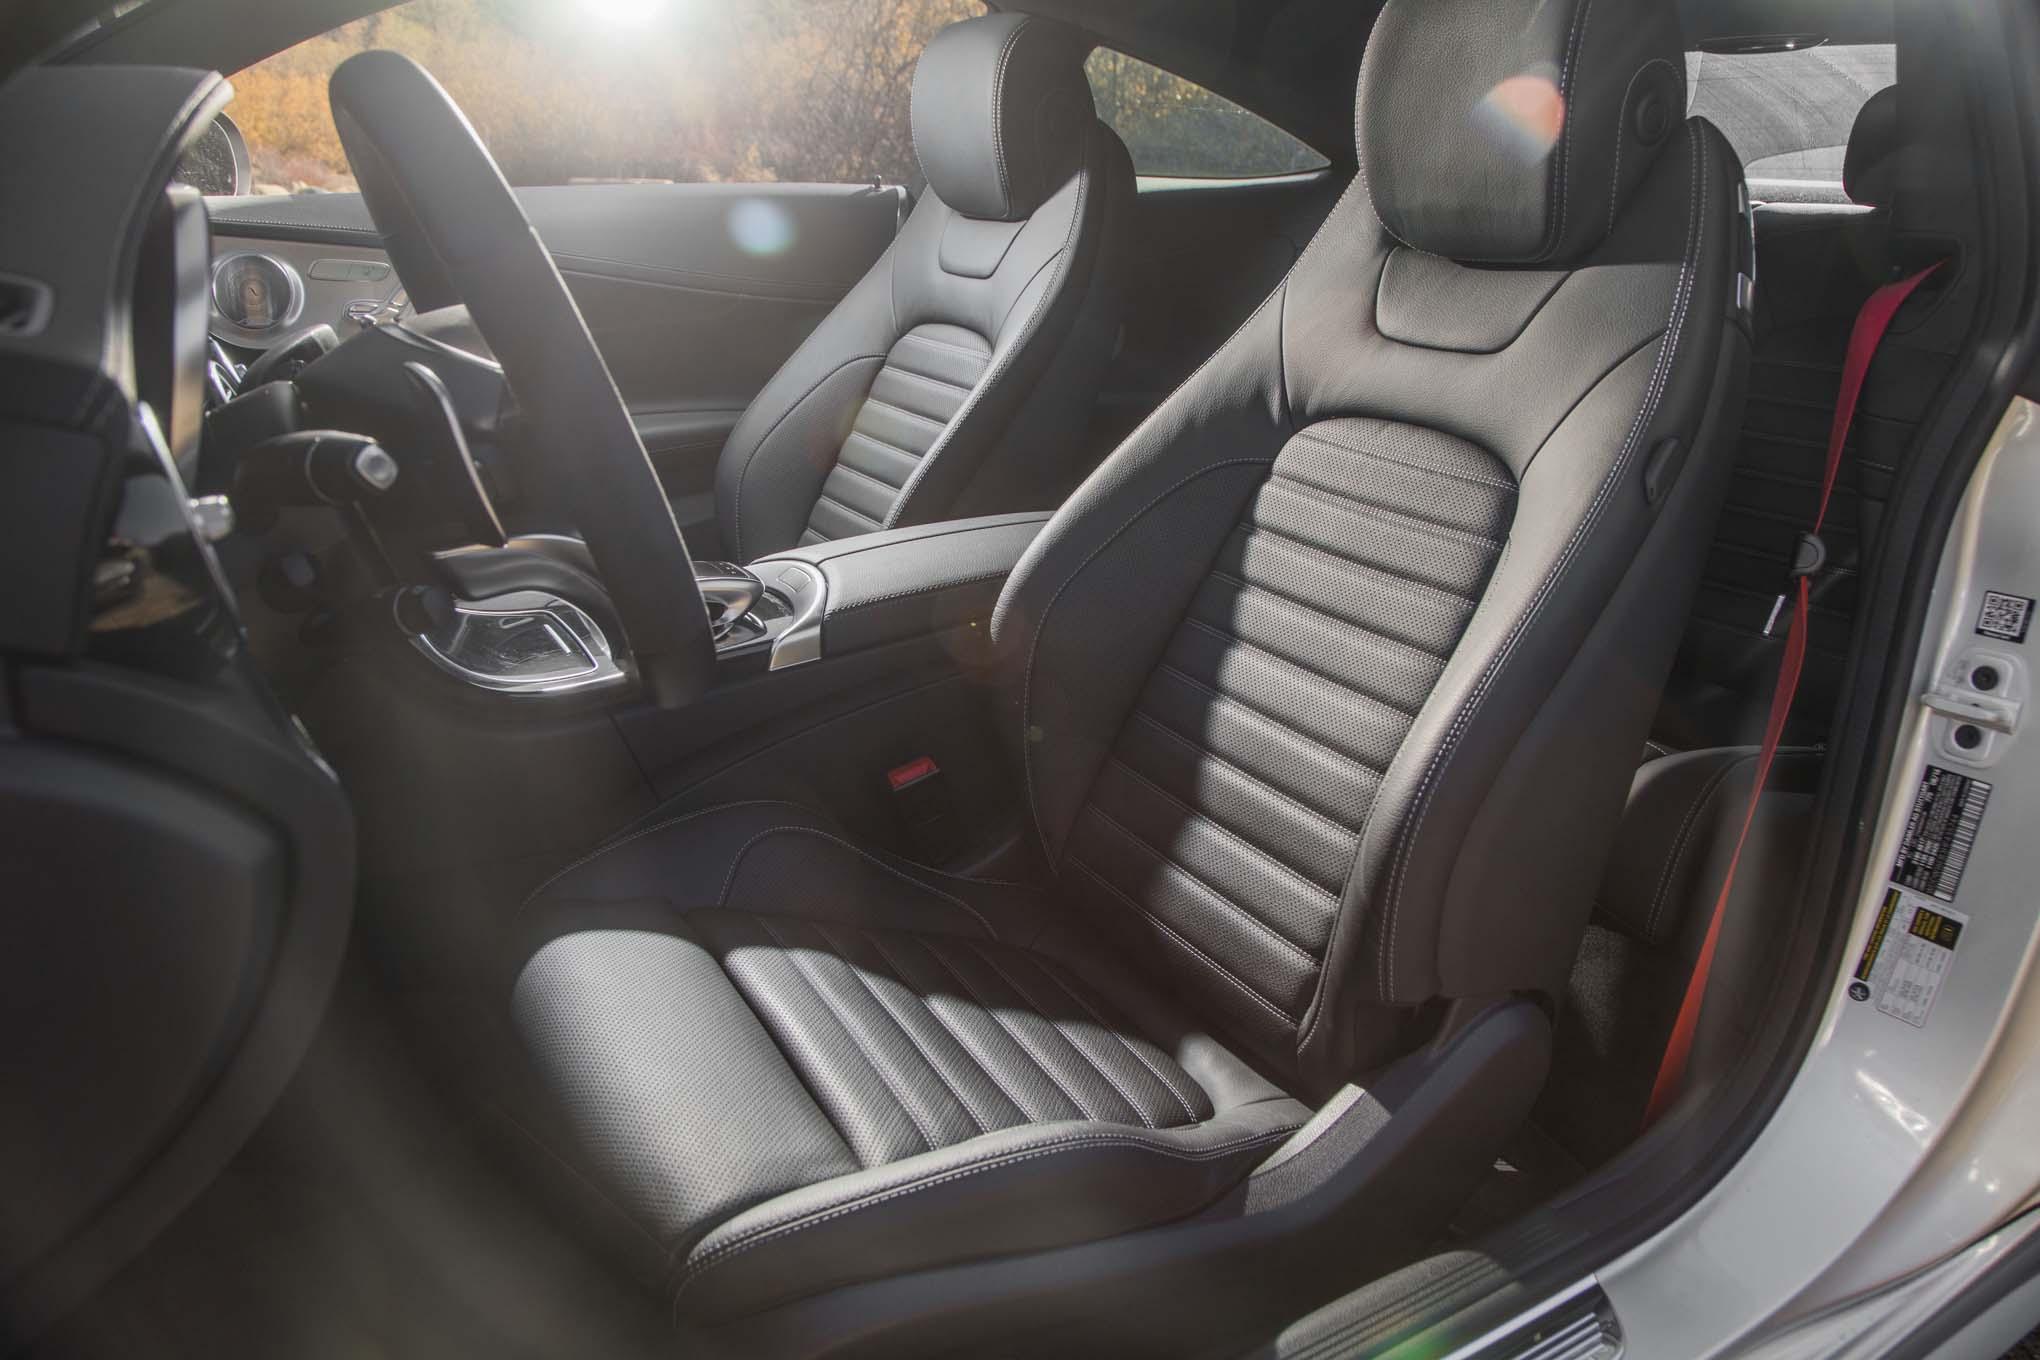 2017 Mercedes AMG C43 Coupe Interior Seats